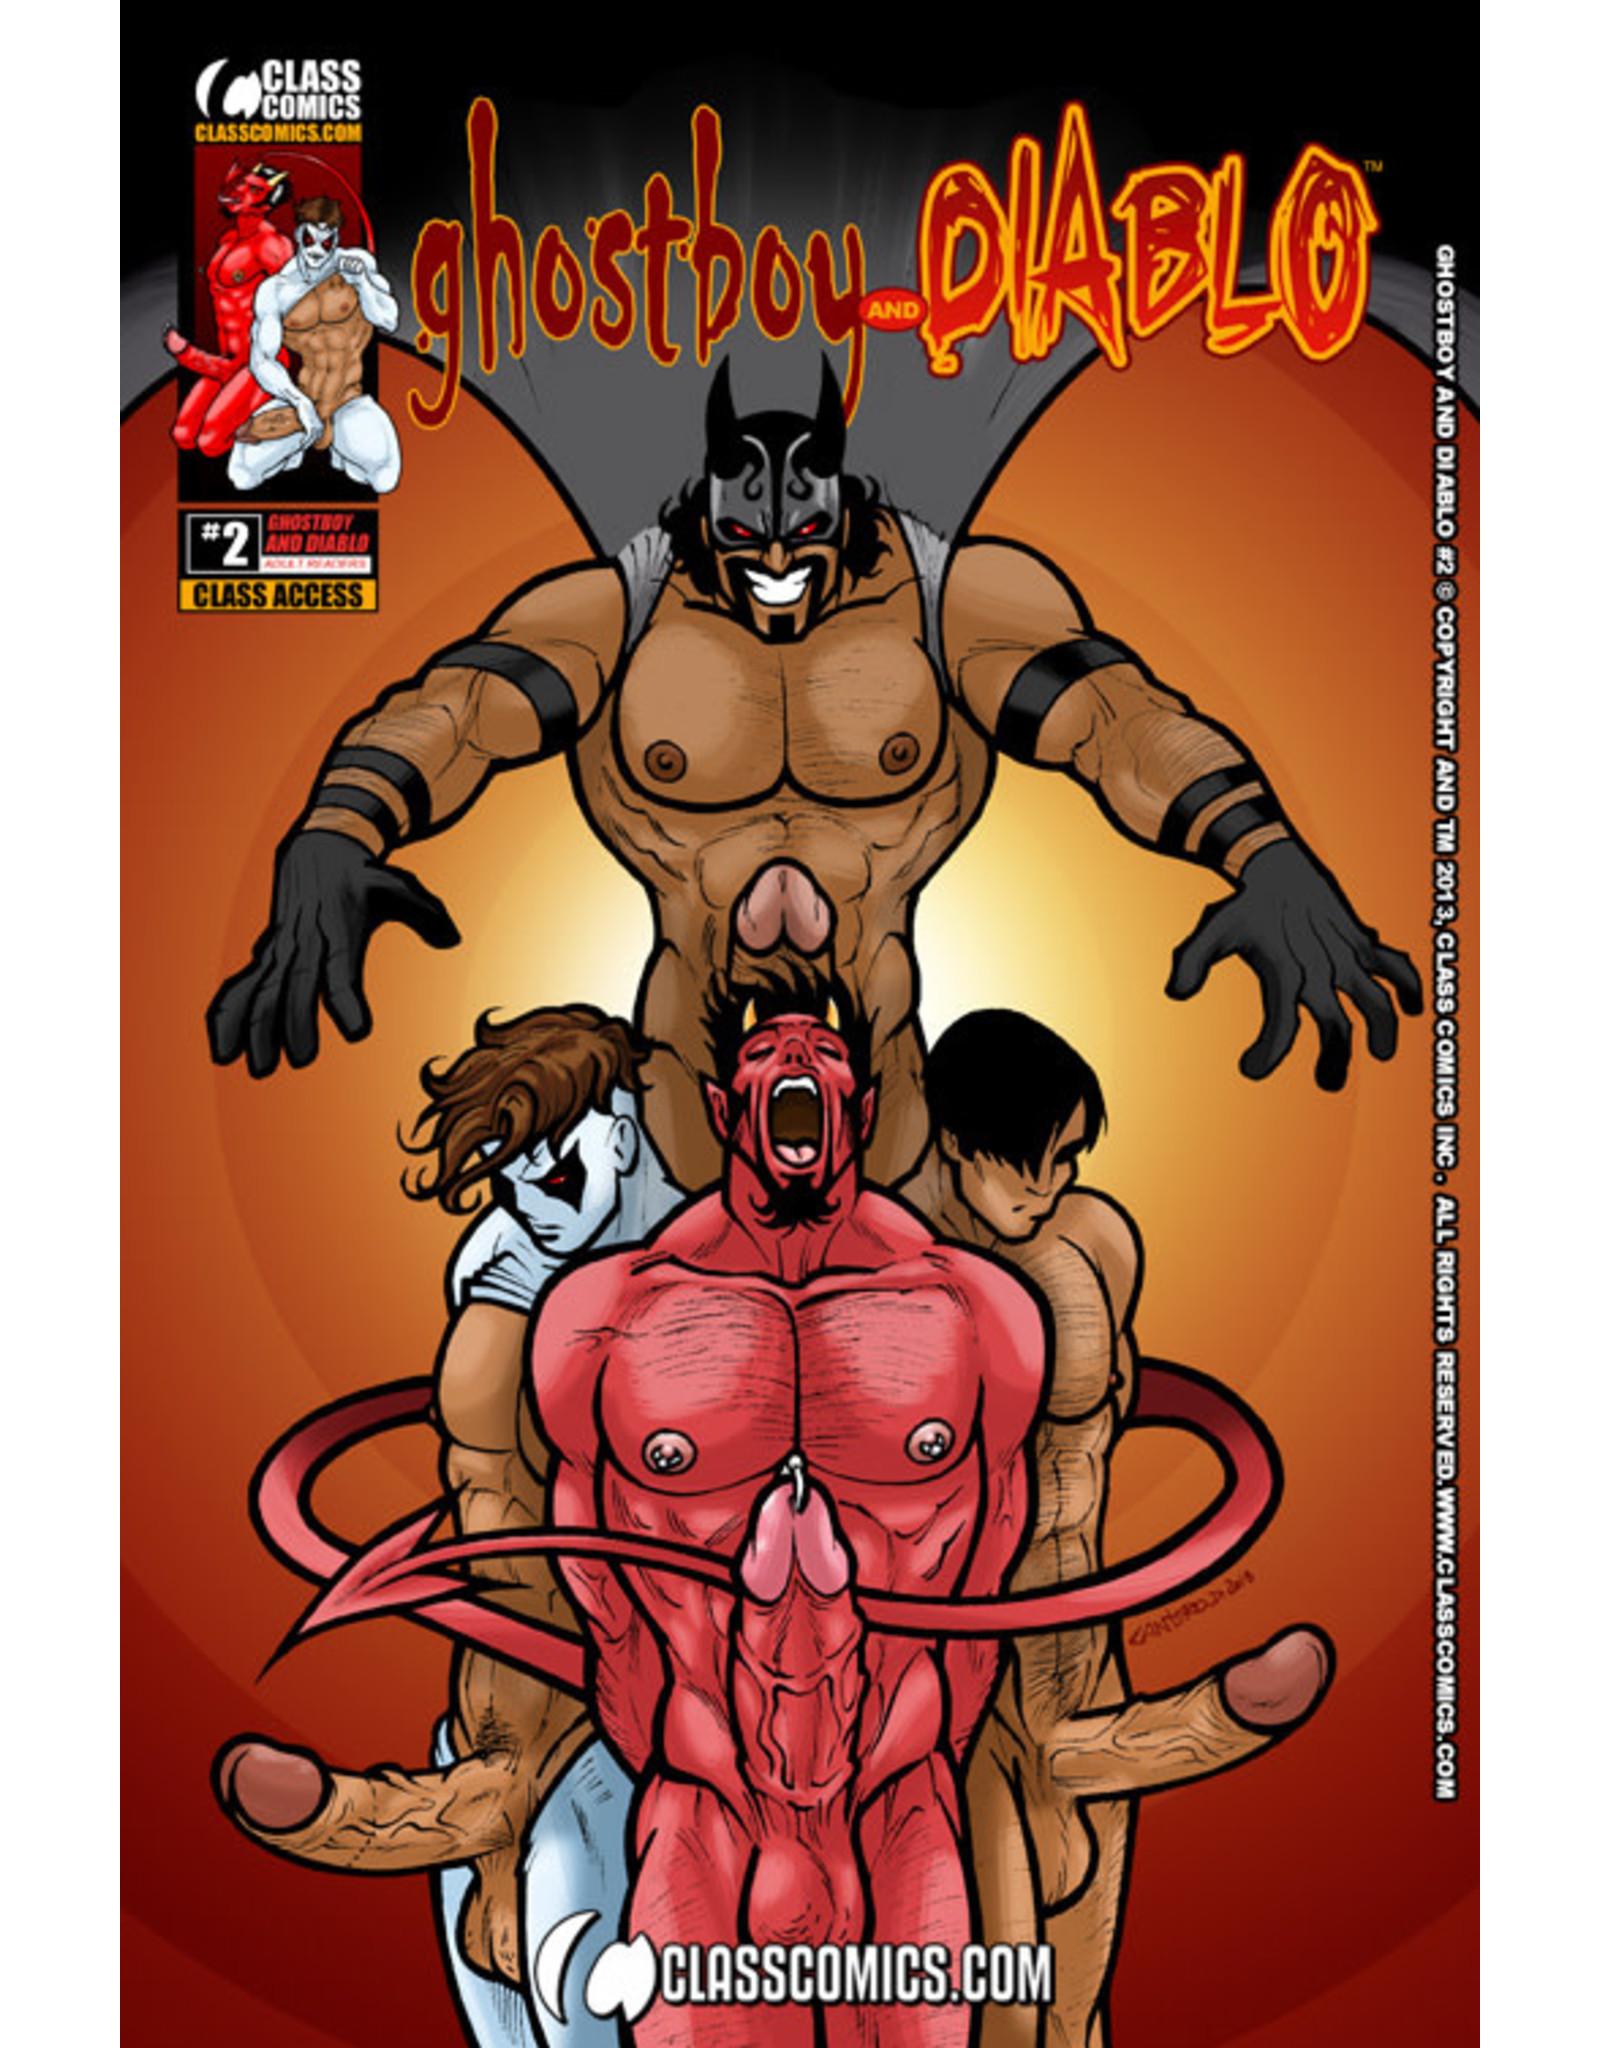 Class Comics Inc. Class Comics Ghostboy and Diablo #2 By Patrick Fillion (Author) David Cantero (Artist)